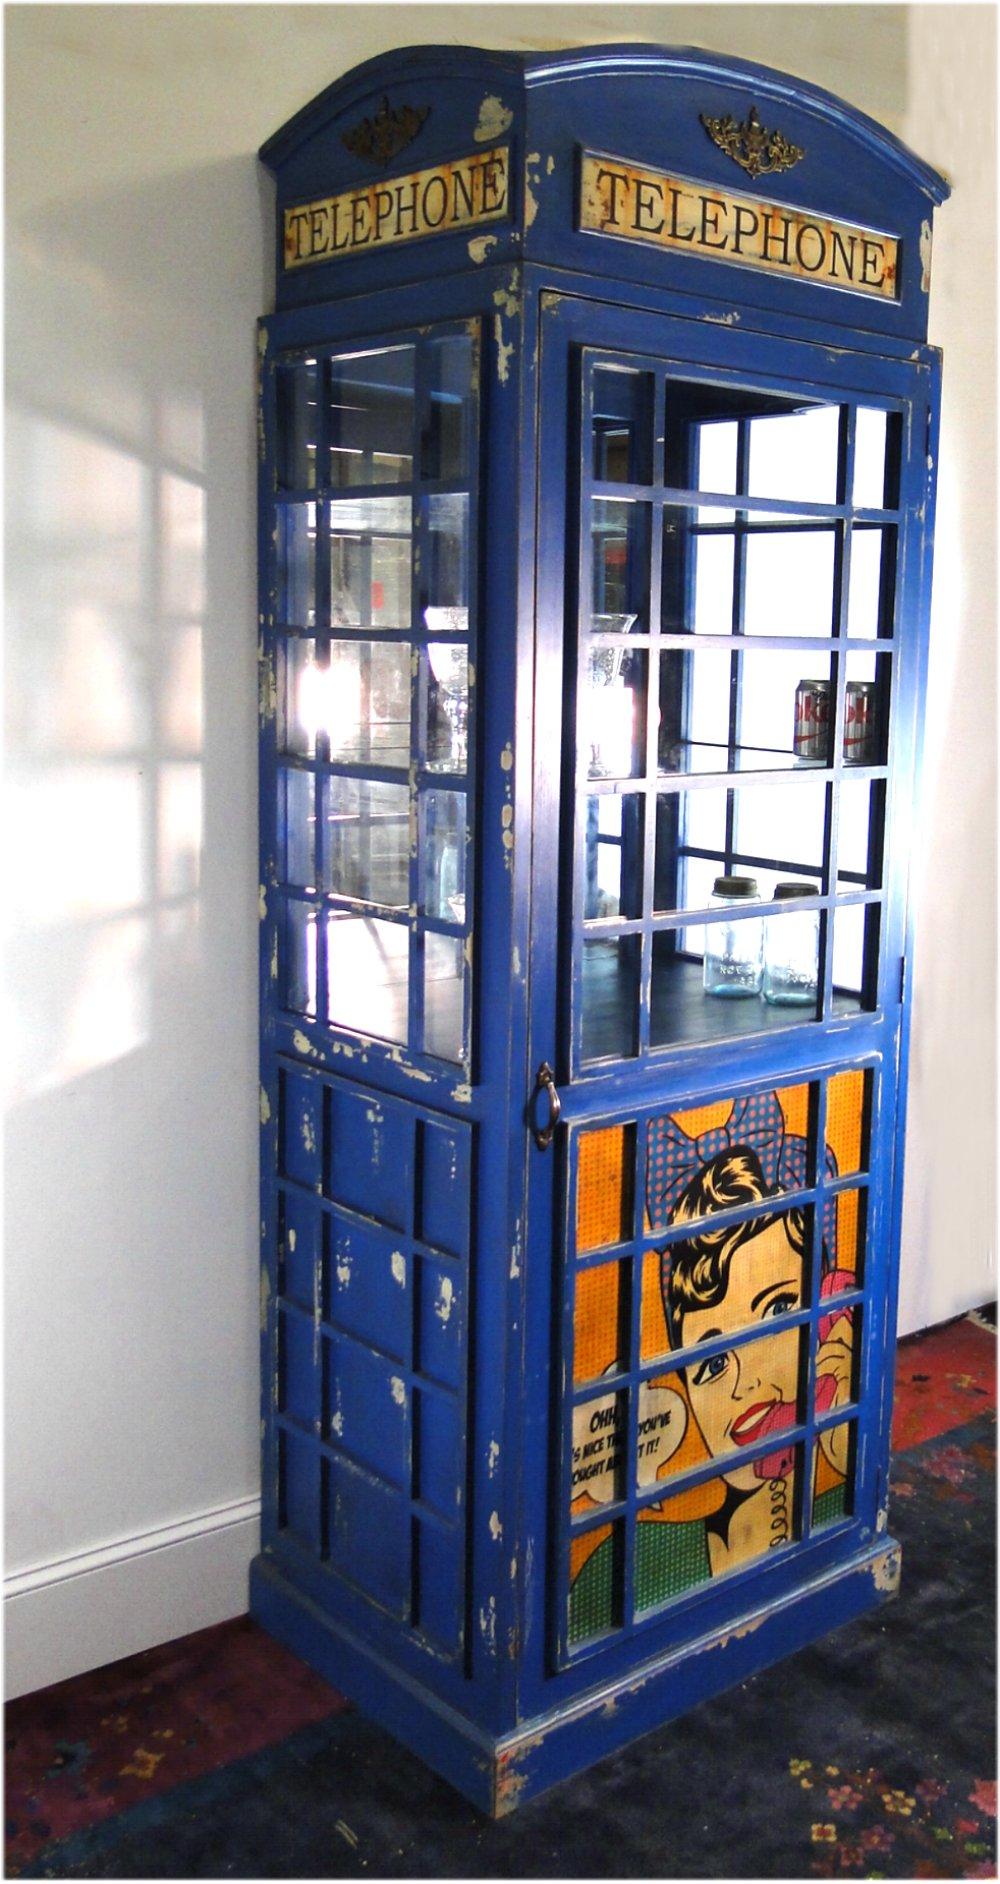 ... Blue British Phone Booth Wine Liquor Cabinet With Retro Artwork ...